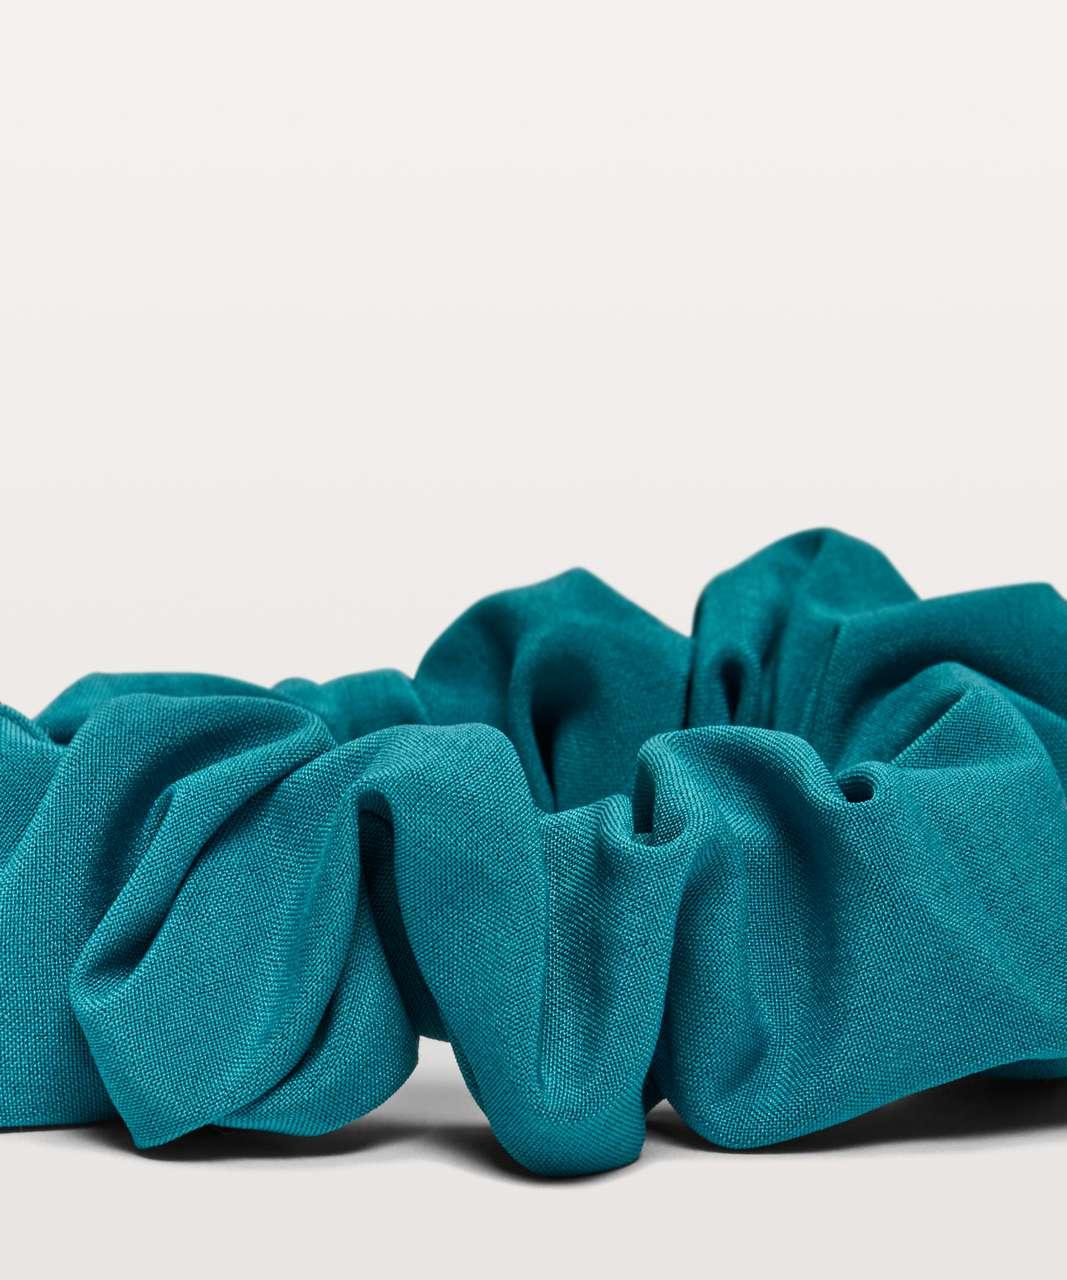 Lululemon Uplifting Scrunchie - Teal Blue